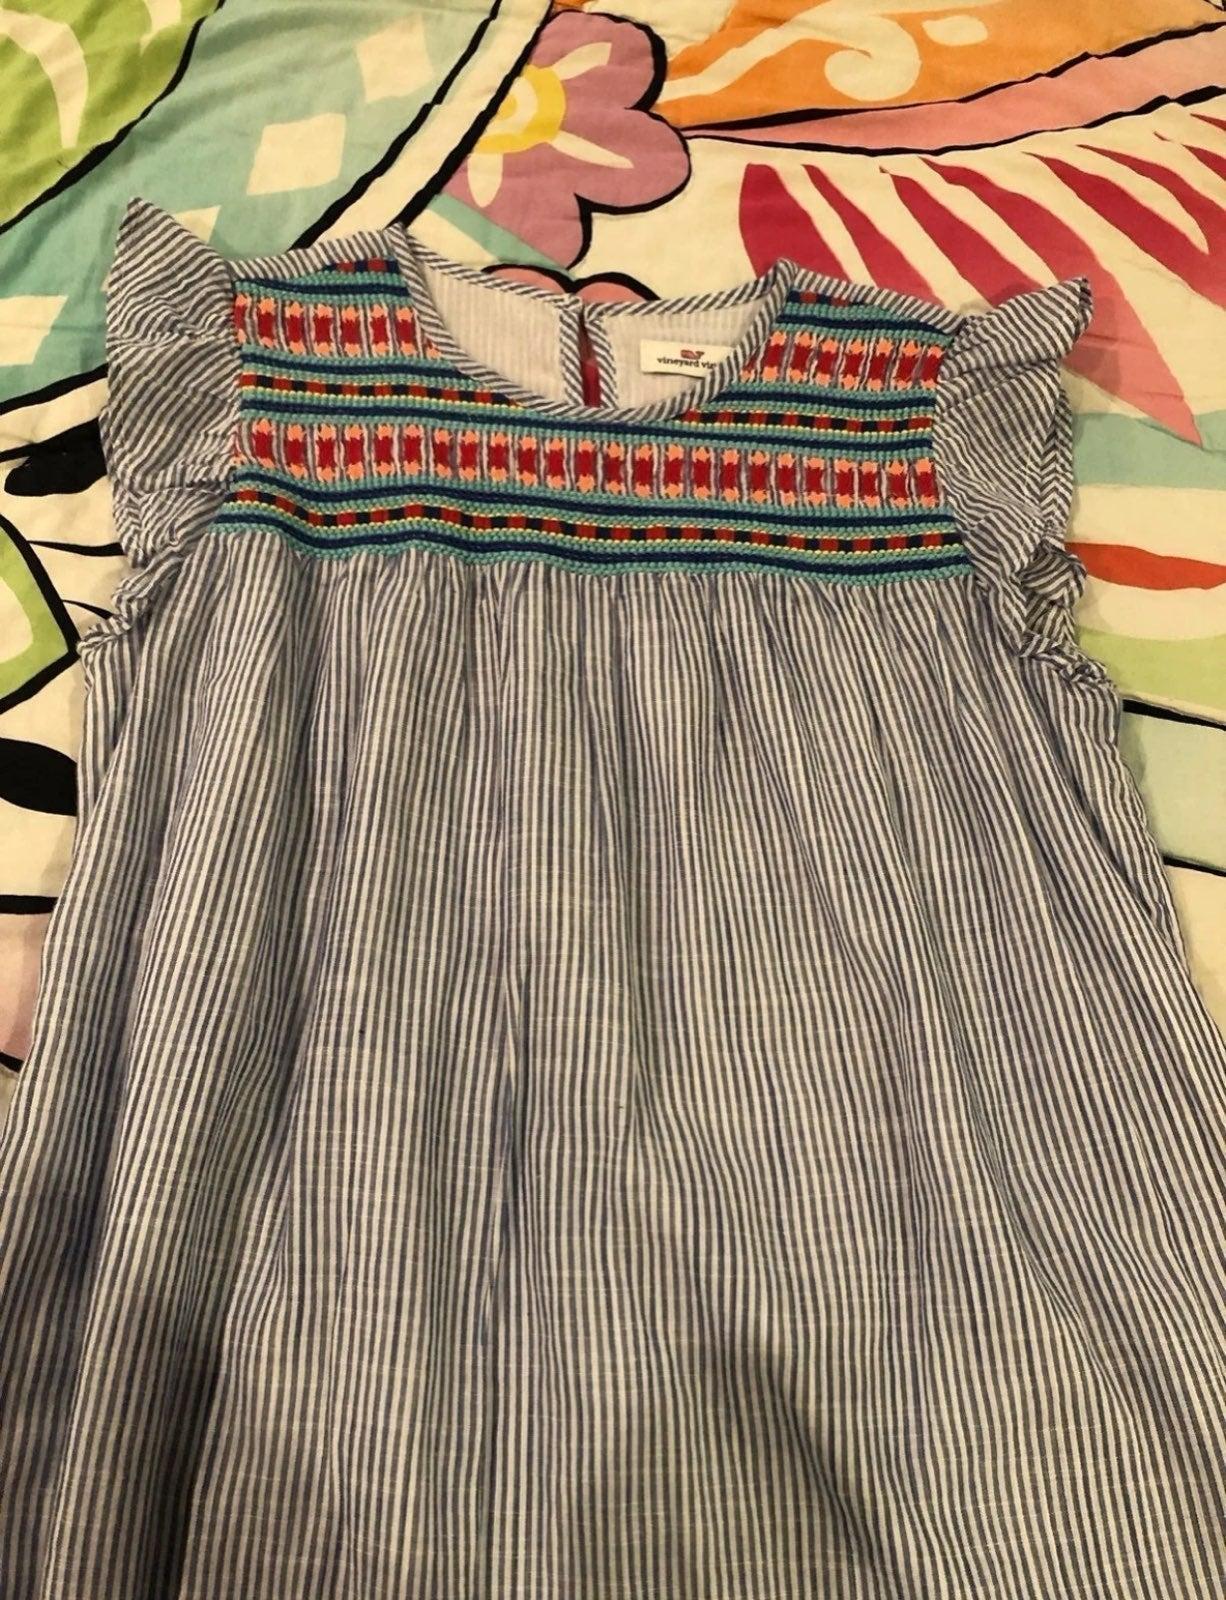 Girls Vineyard Vines dress size 14